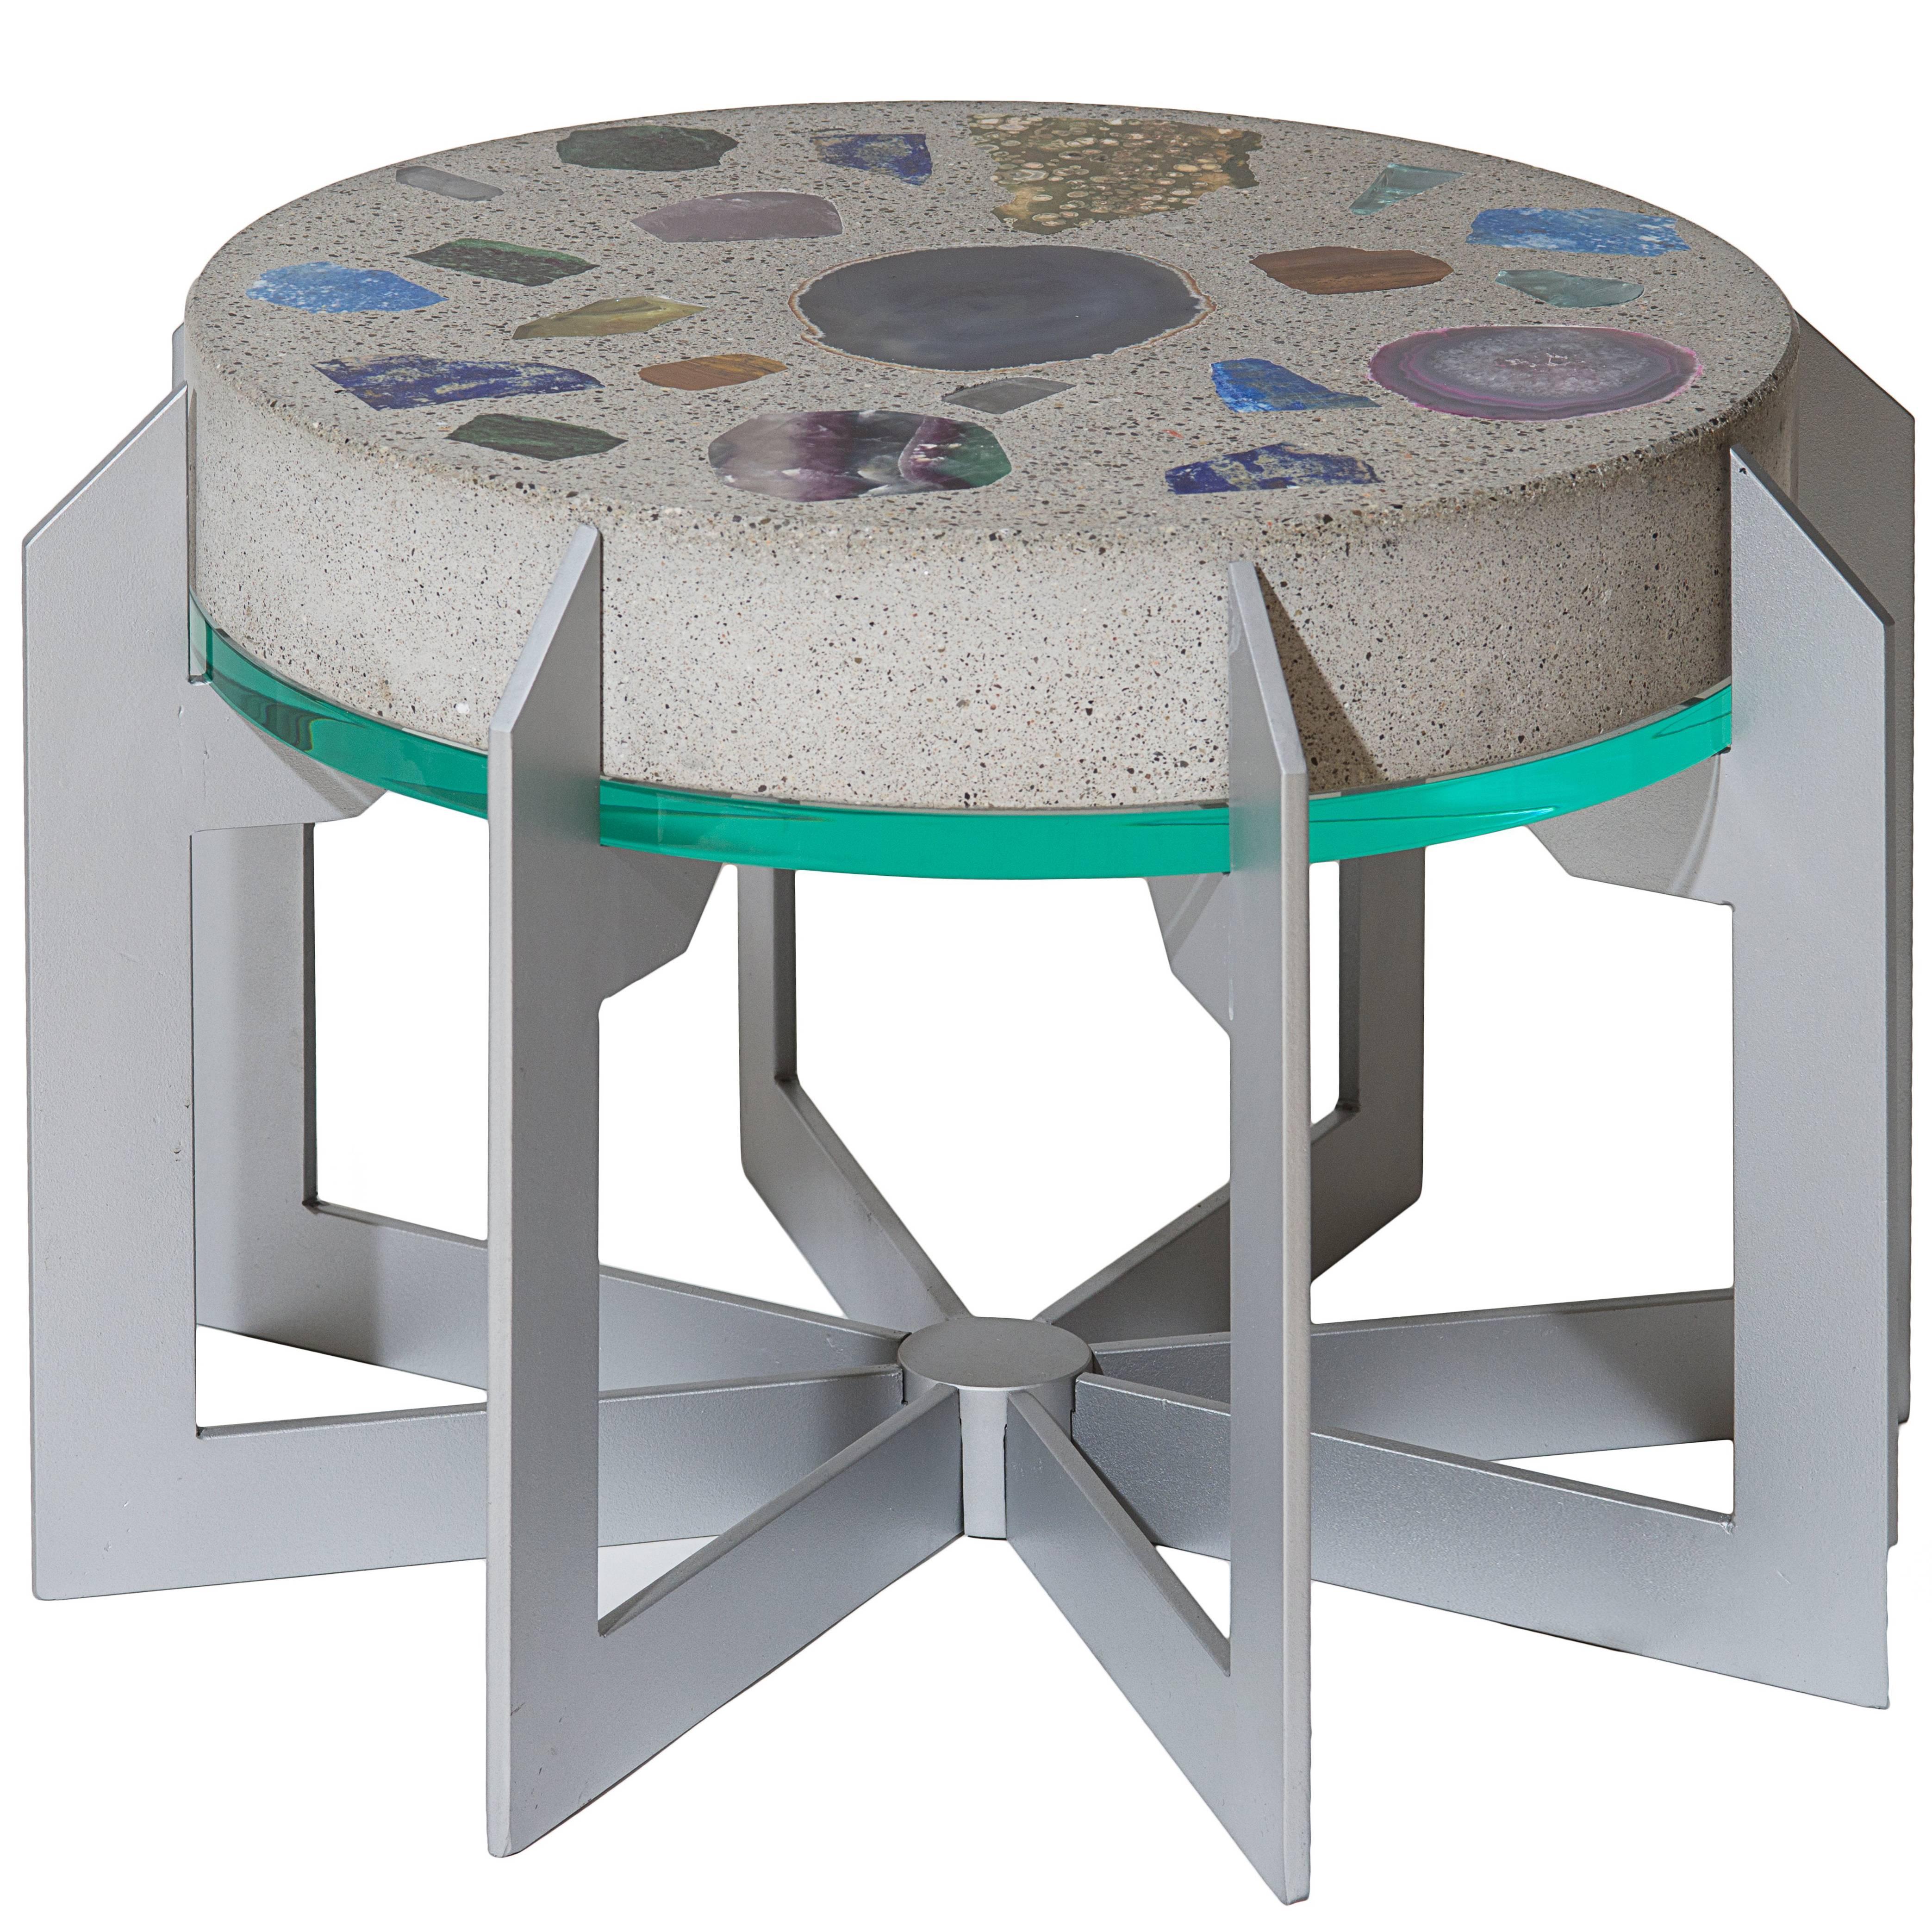 Cloud Table, Unique Piece, Studio Superego, Italy For Sale